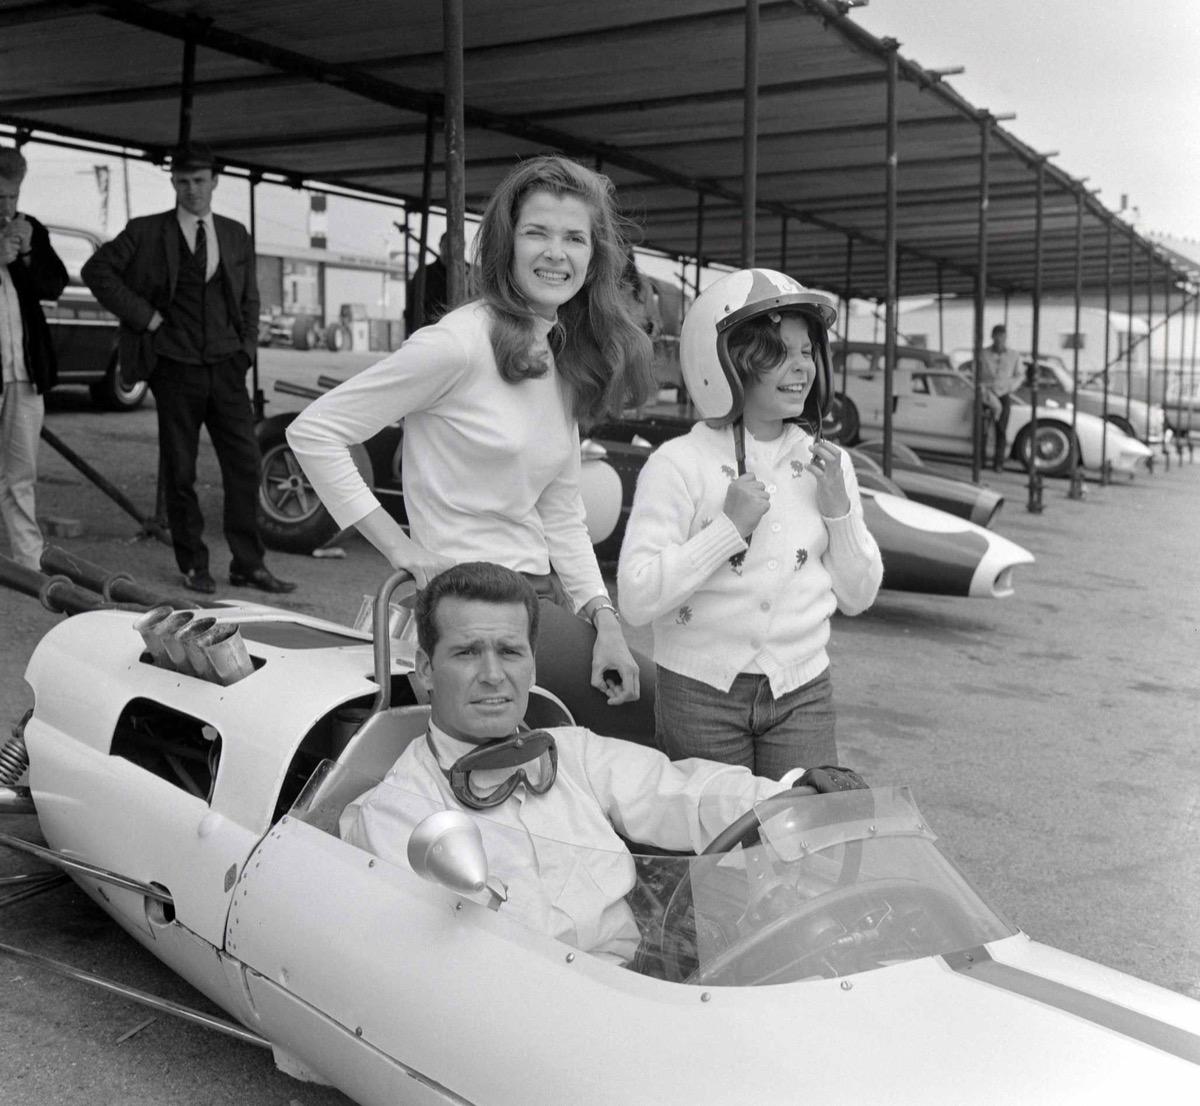 jessica walter and james garner in a formula one car